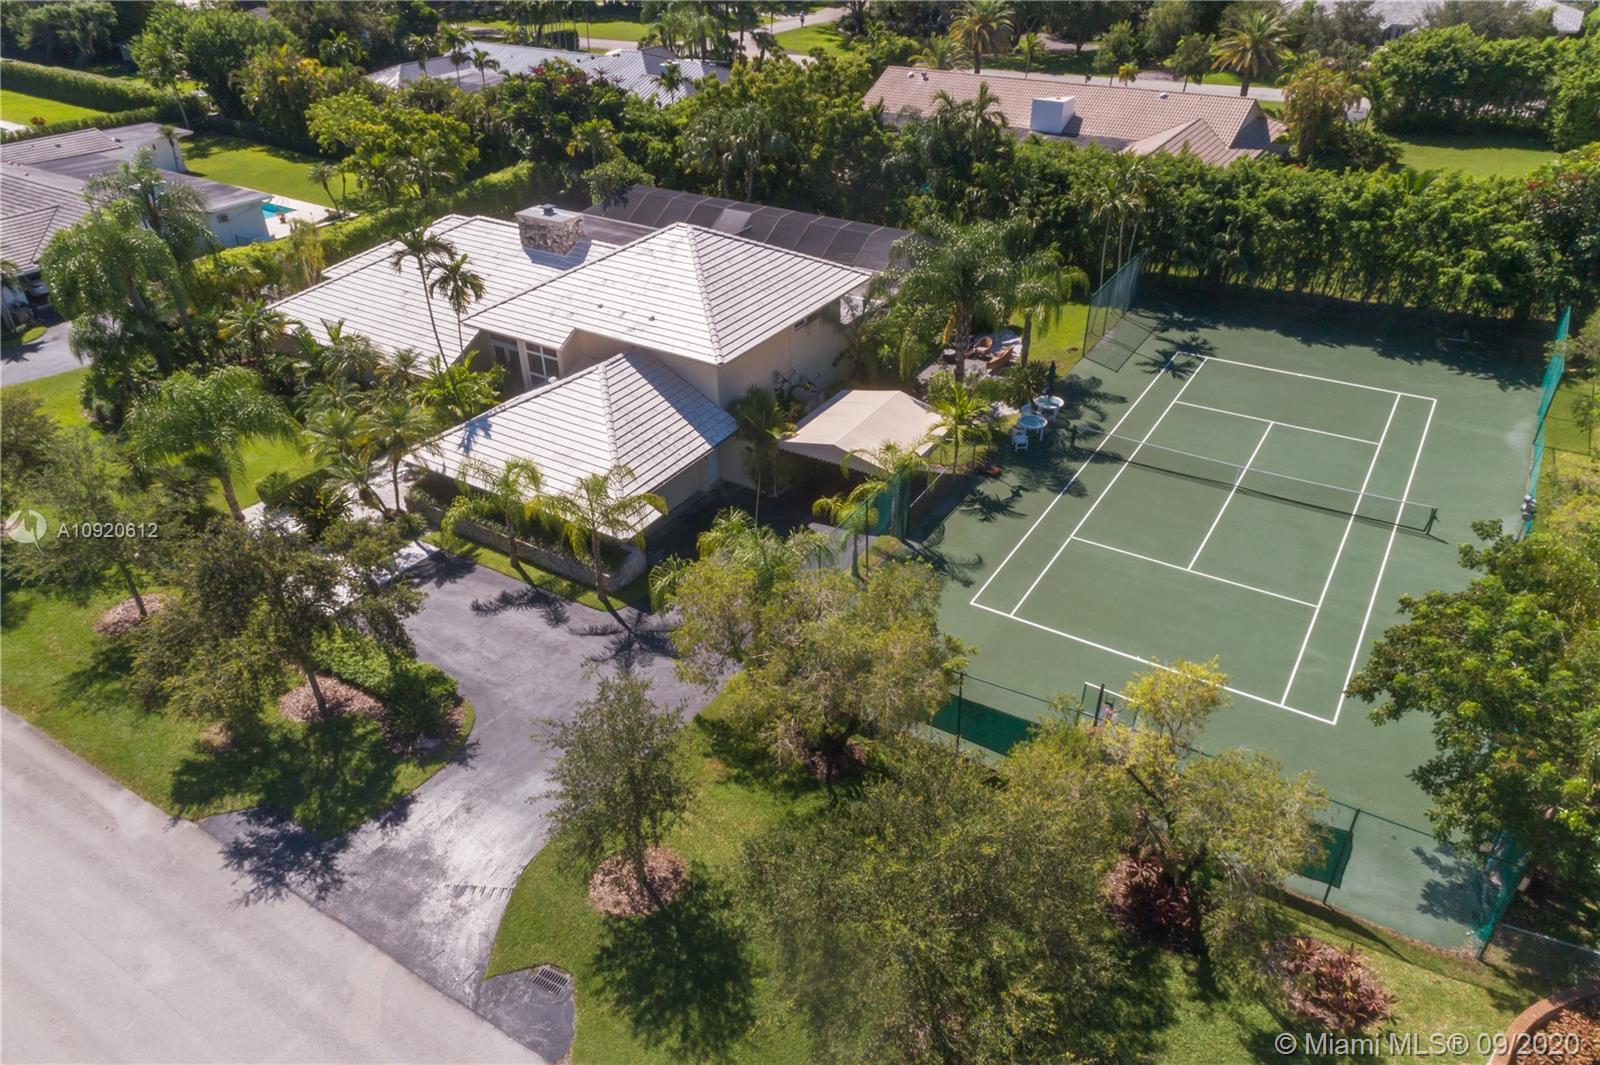 Pine Bay Estates - 5940 SW 116th St, Coral Gables, FL 33156